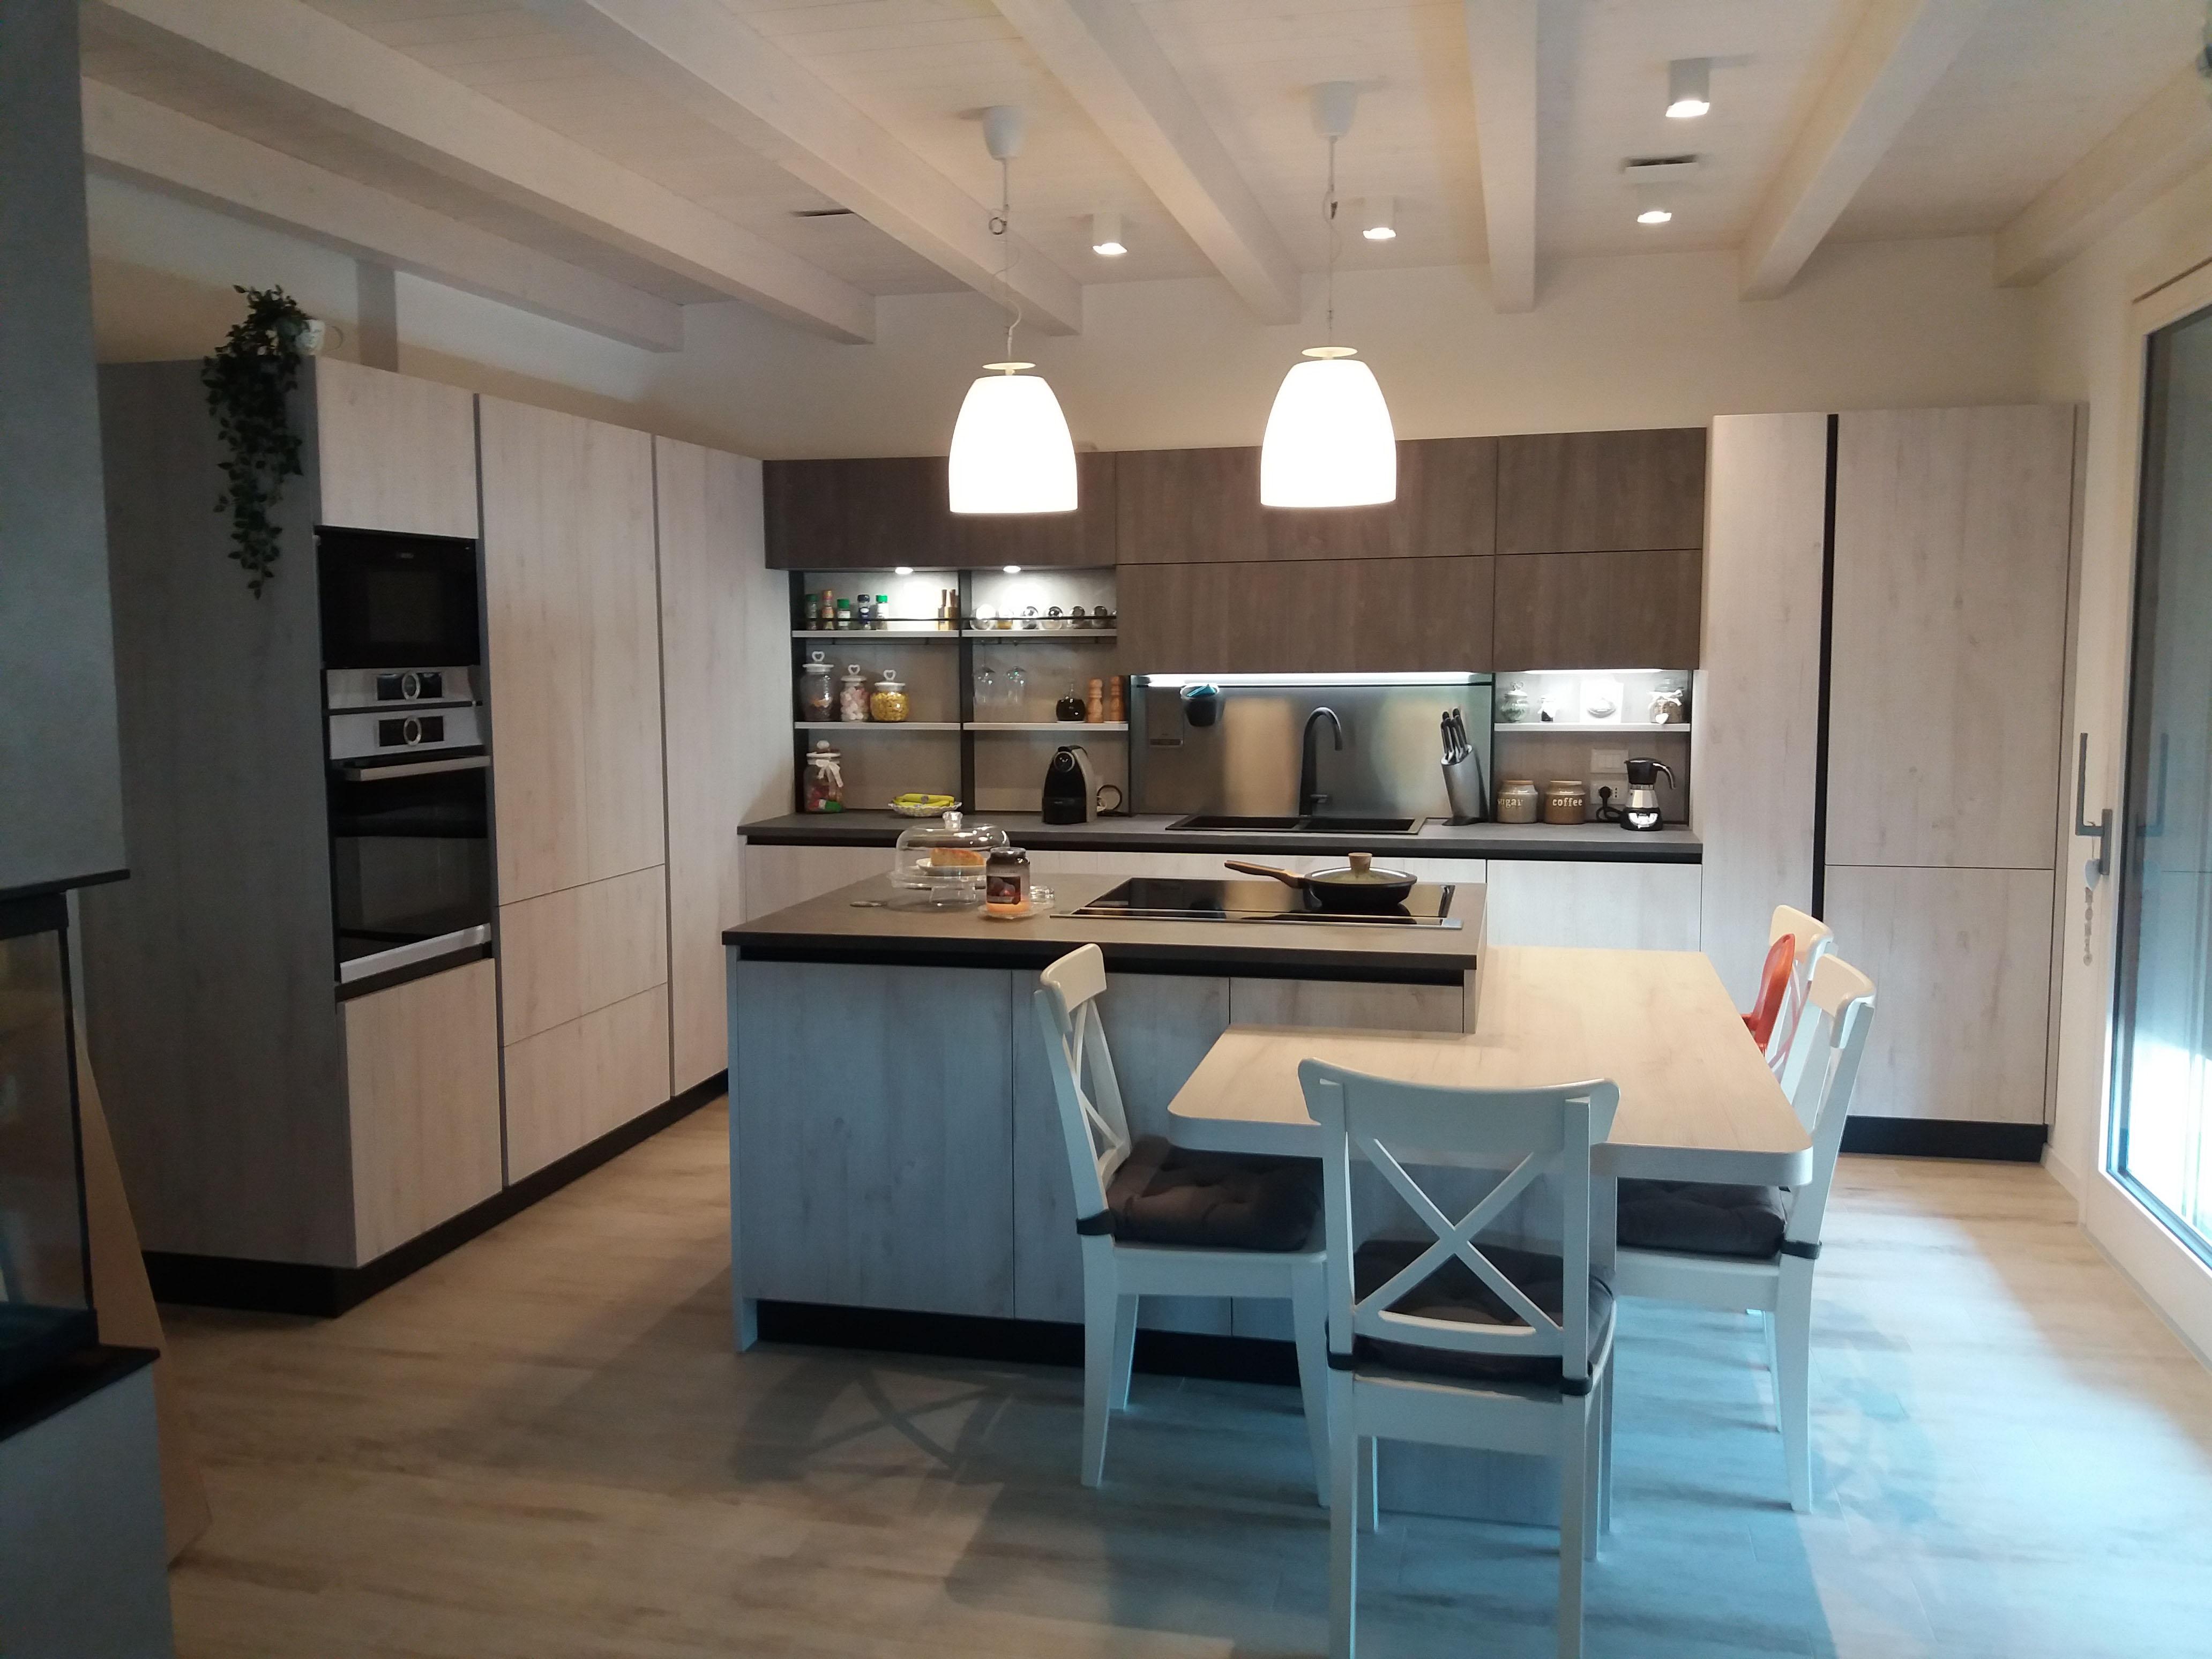 Cucina -OYSTER DEK- Veneta Cucine - Minelle Arredamenti